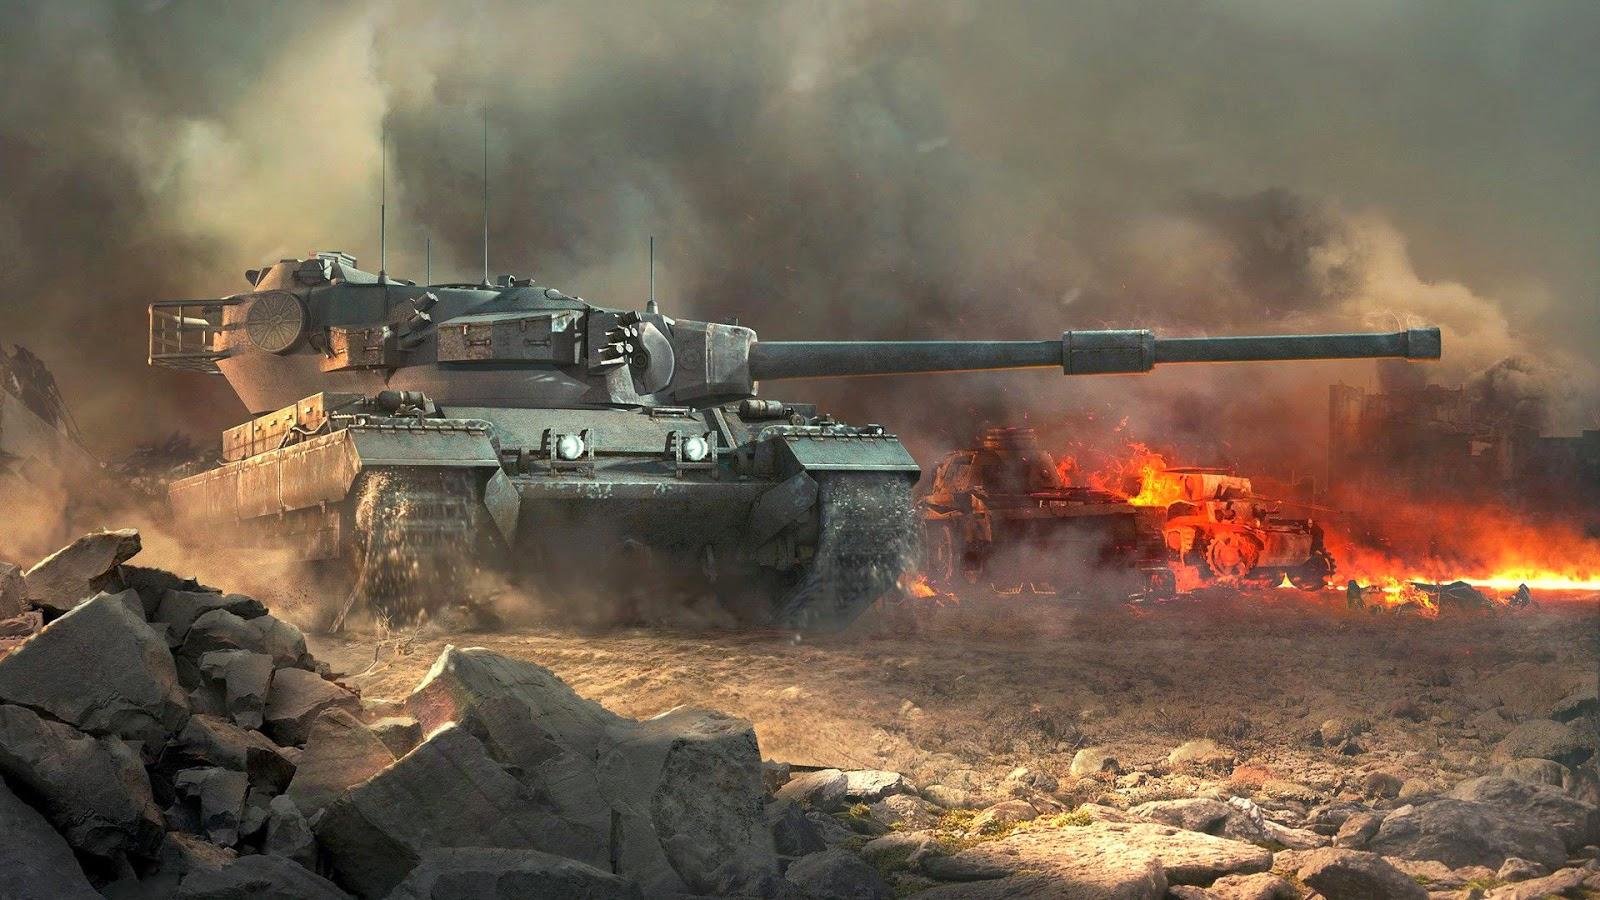 wot_world_of_tanks_HD_wallpaper_2014_2015_free_to_play_PC_game_f2p_Tanks_fire_war_download_www.epichdwallpapers.com